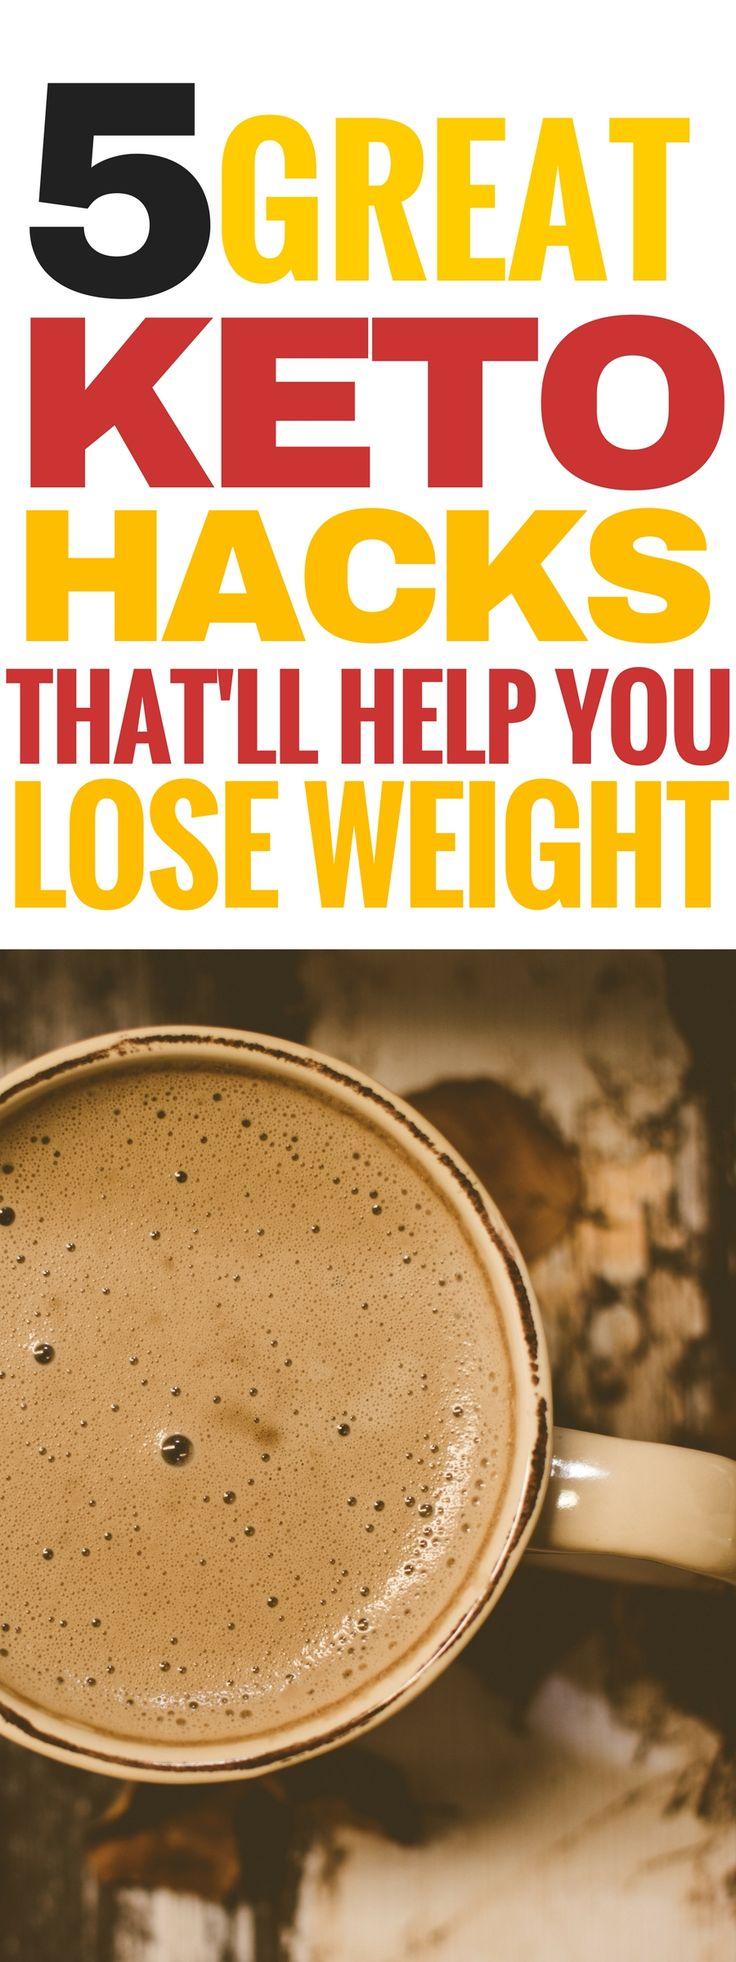 Best 25+ Ketogenic diet ideas on Pinterest | Ketogenic diet plan, Ketosis diet plan and Ketosis diet